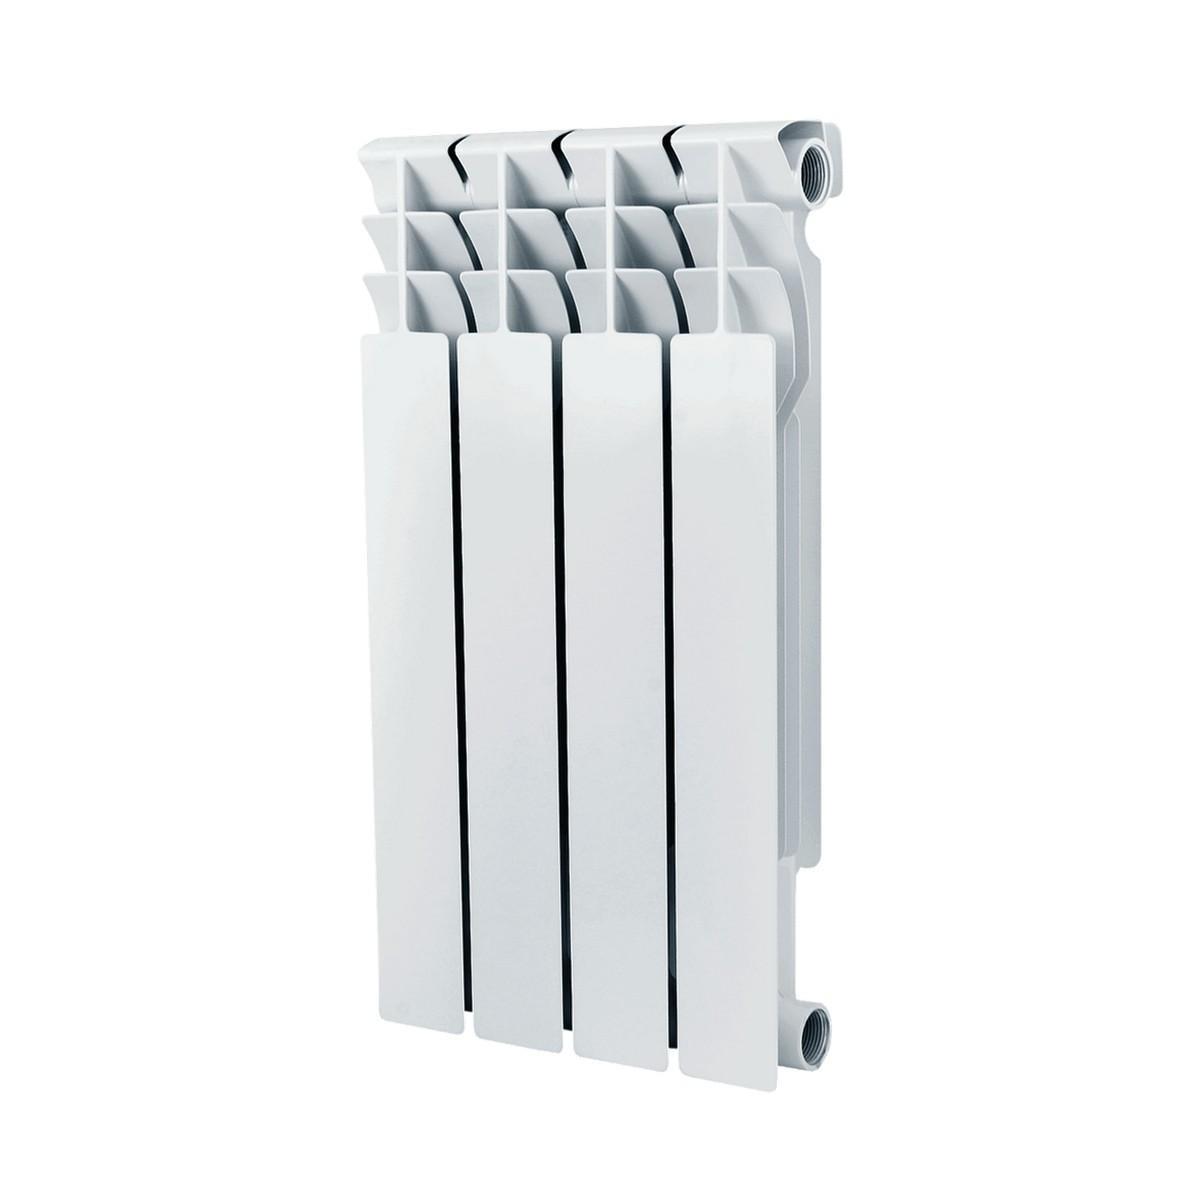 Радиатор биметалл Ultra Plus 350 9 секций Ogint  117-5985